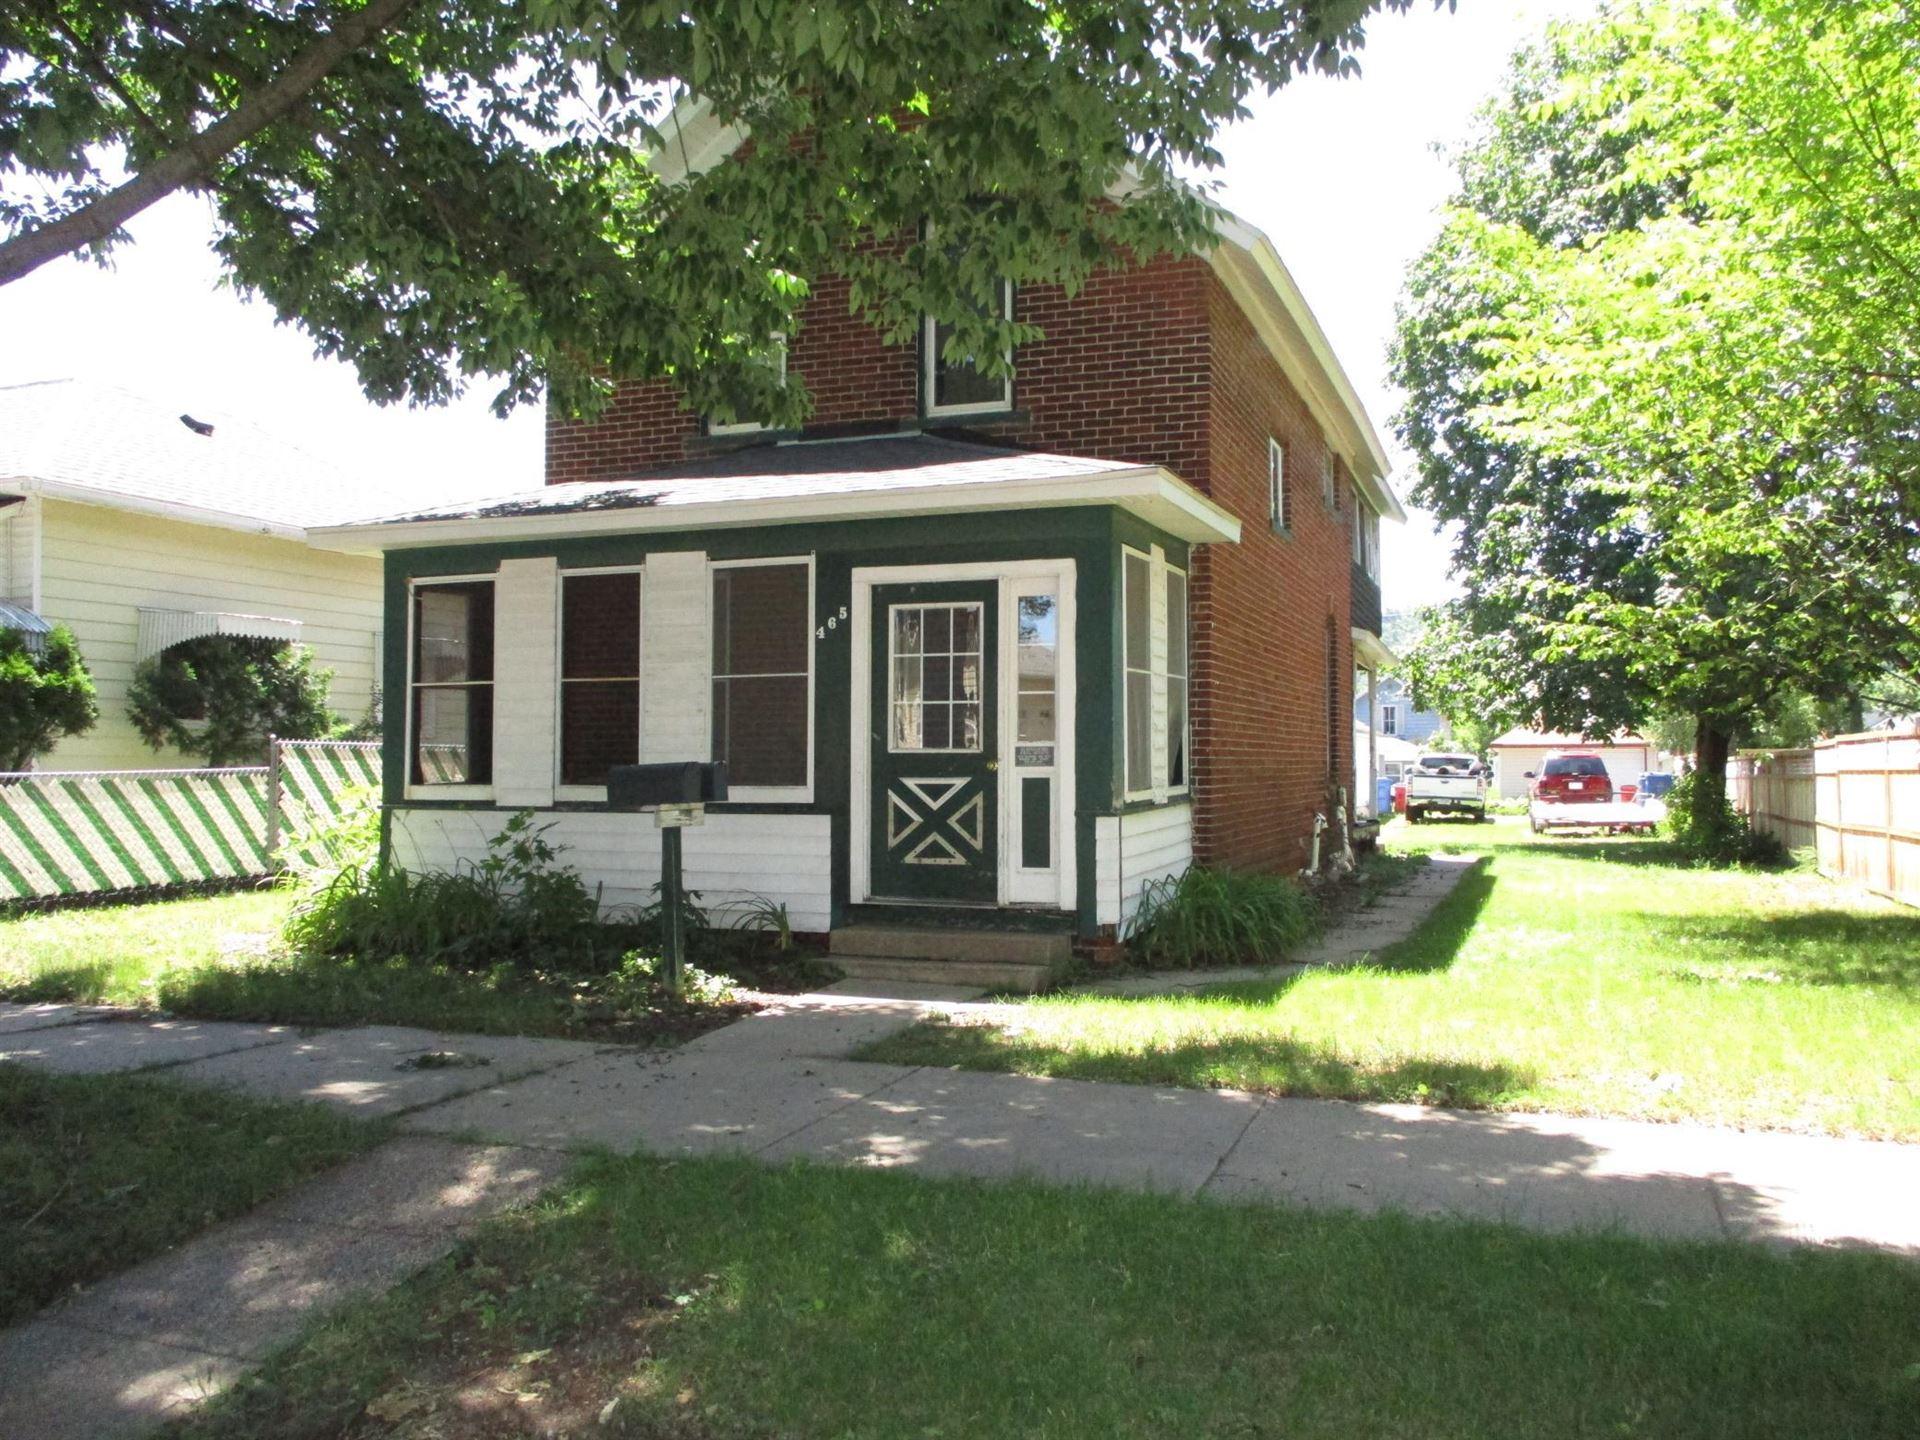 465 E King Street, Winona, MN 55987 - MLS#: 6011922